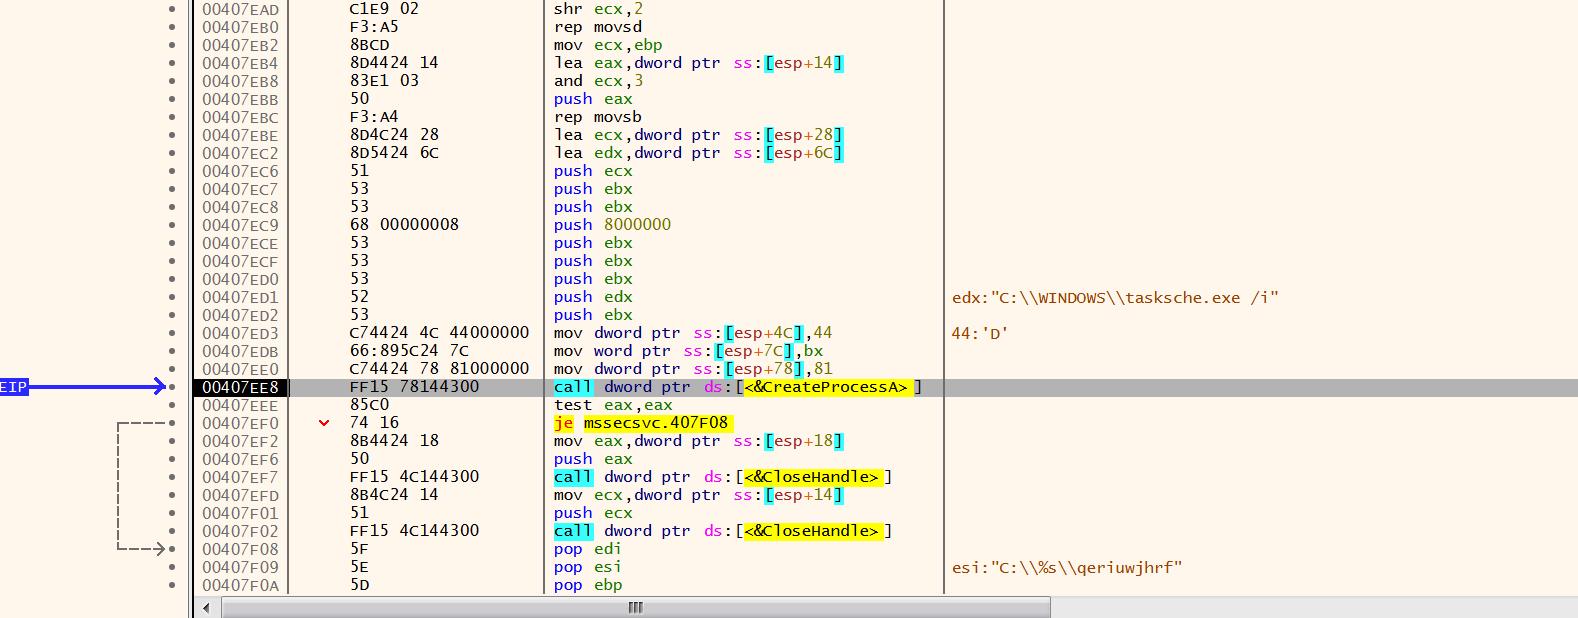 Reverse engineering of a WannaCry sample